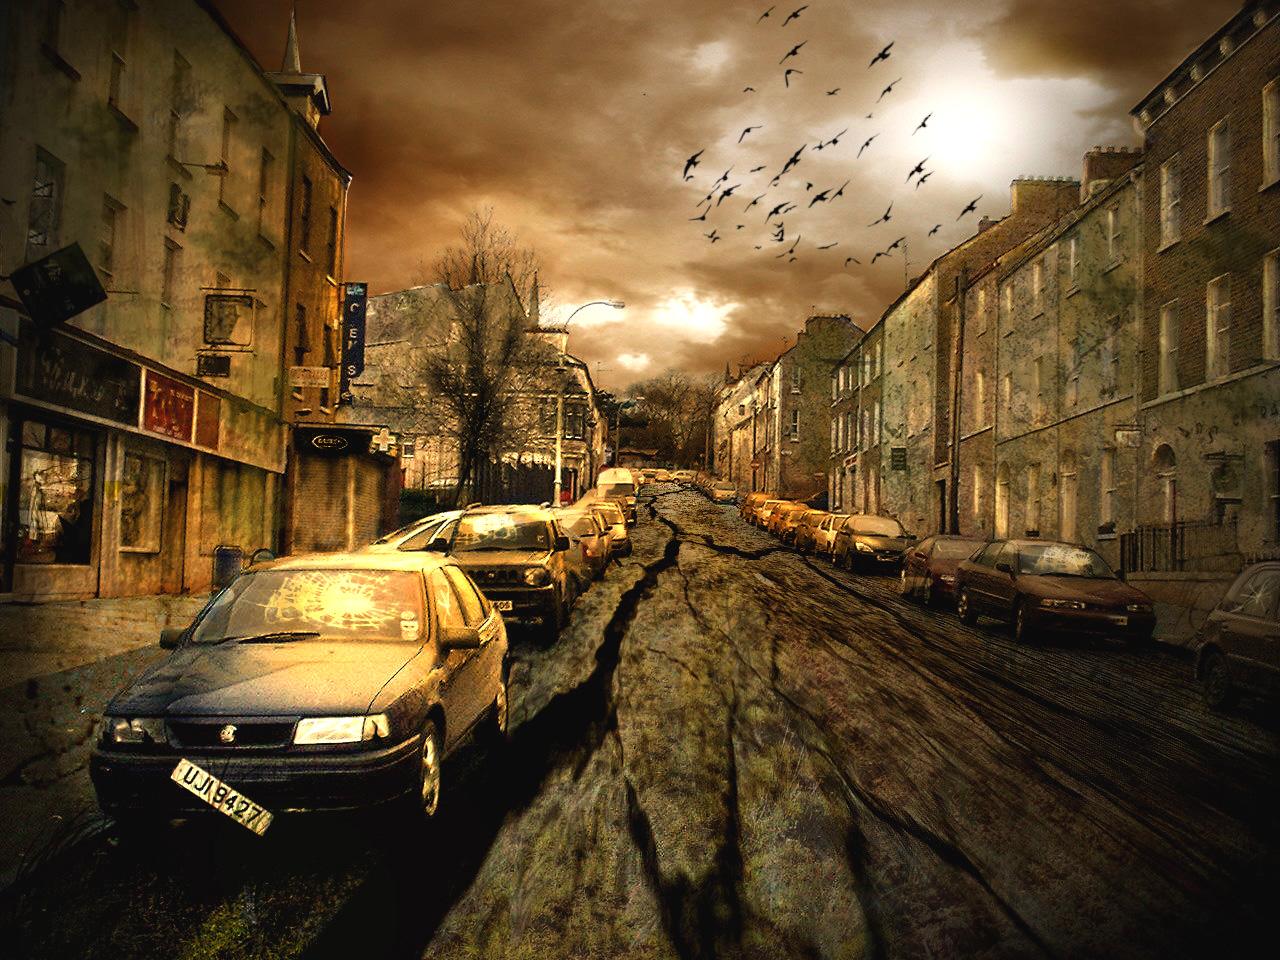 [ZONE DU RP] Post_apocalyptic_derry_street_by_dookieadz-d3a8l2d